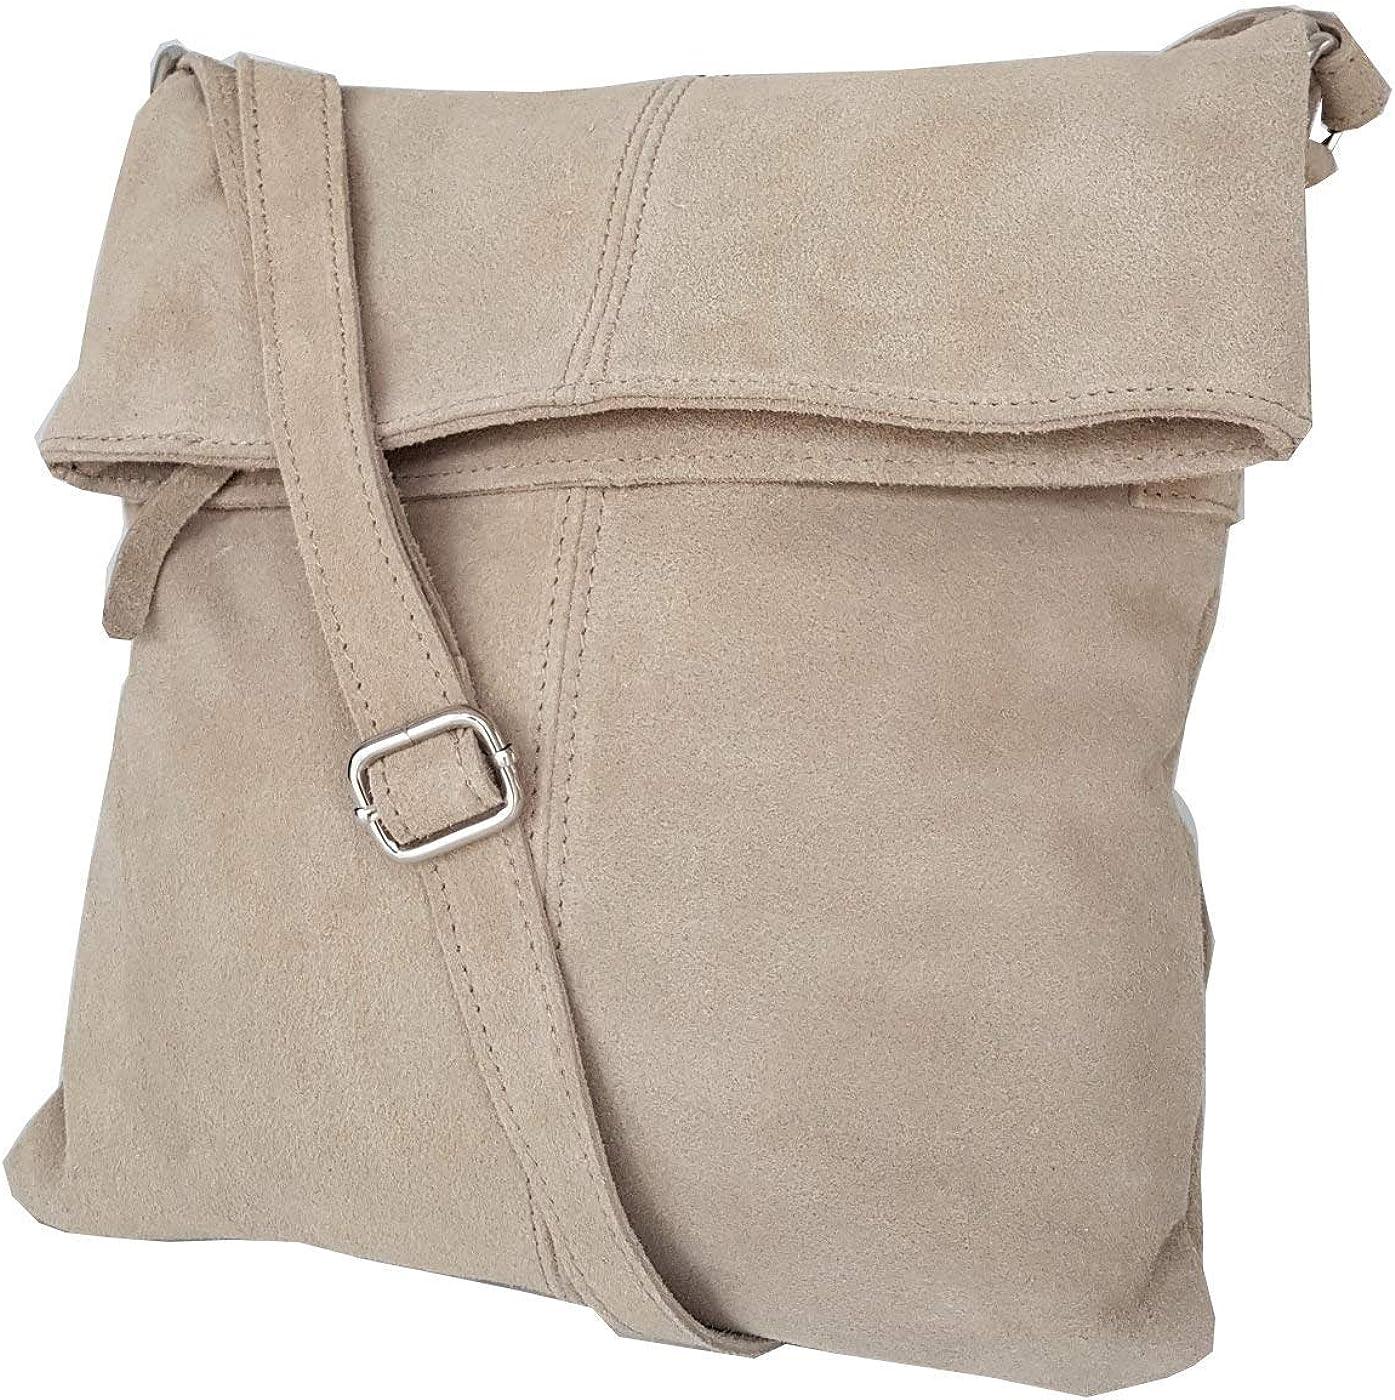 fashion-formel Cuir sac /à bandouli/ère Messenger daim mod 2030-p